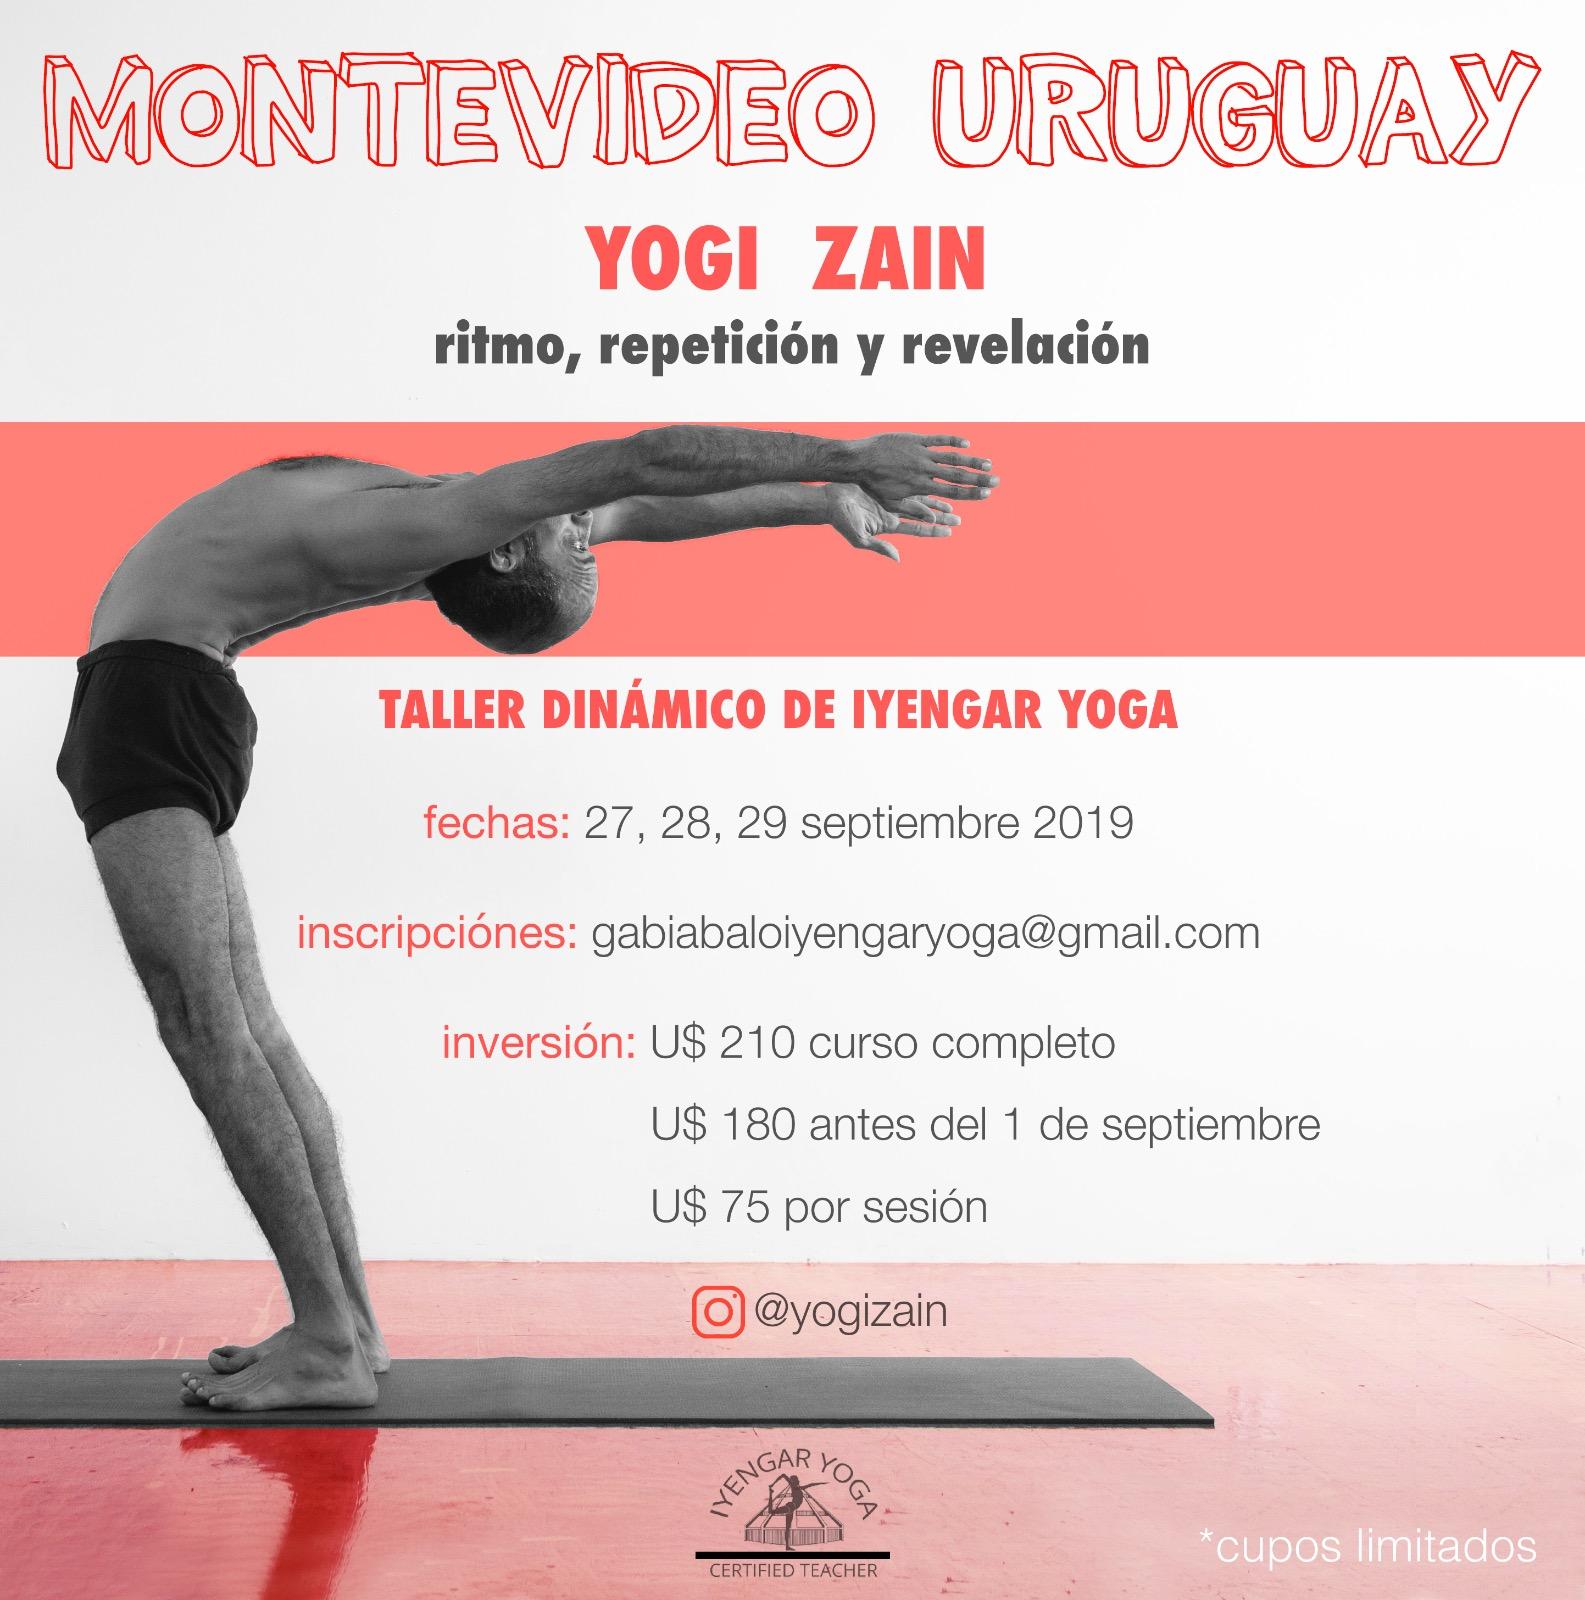 yogi-zain-montevideo-uruguay.jpeg